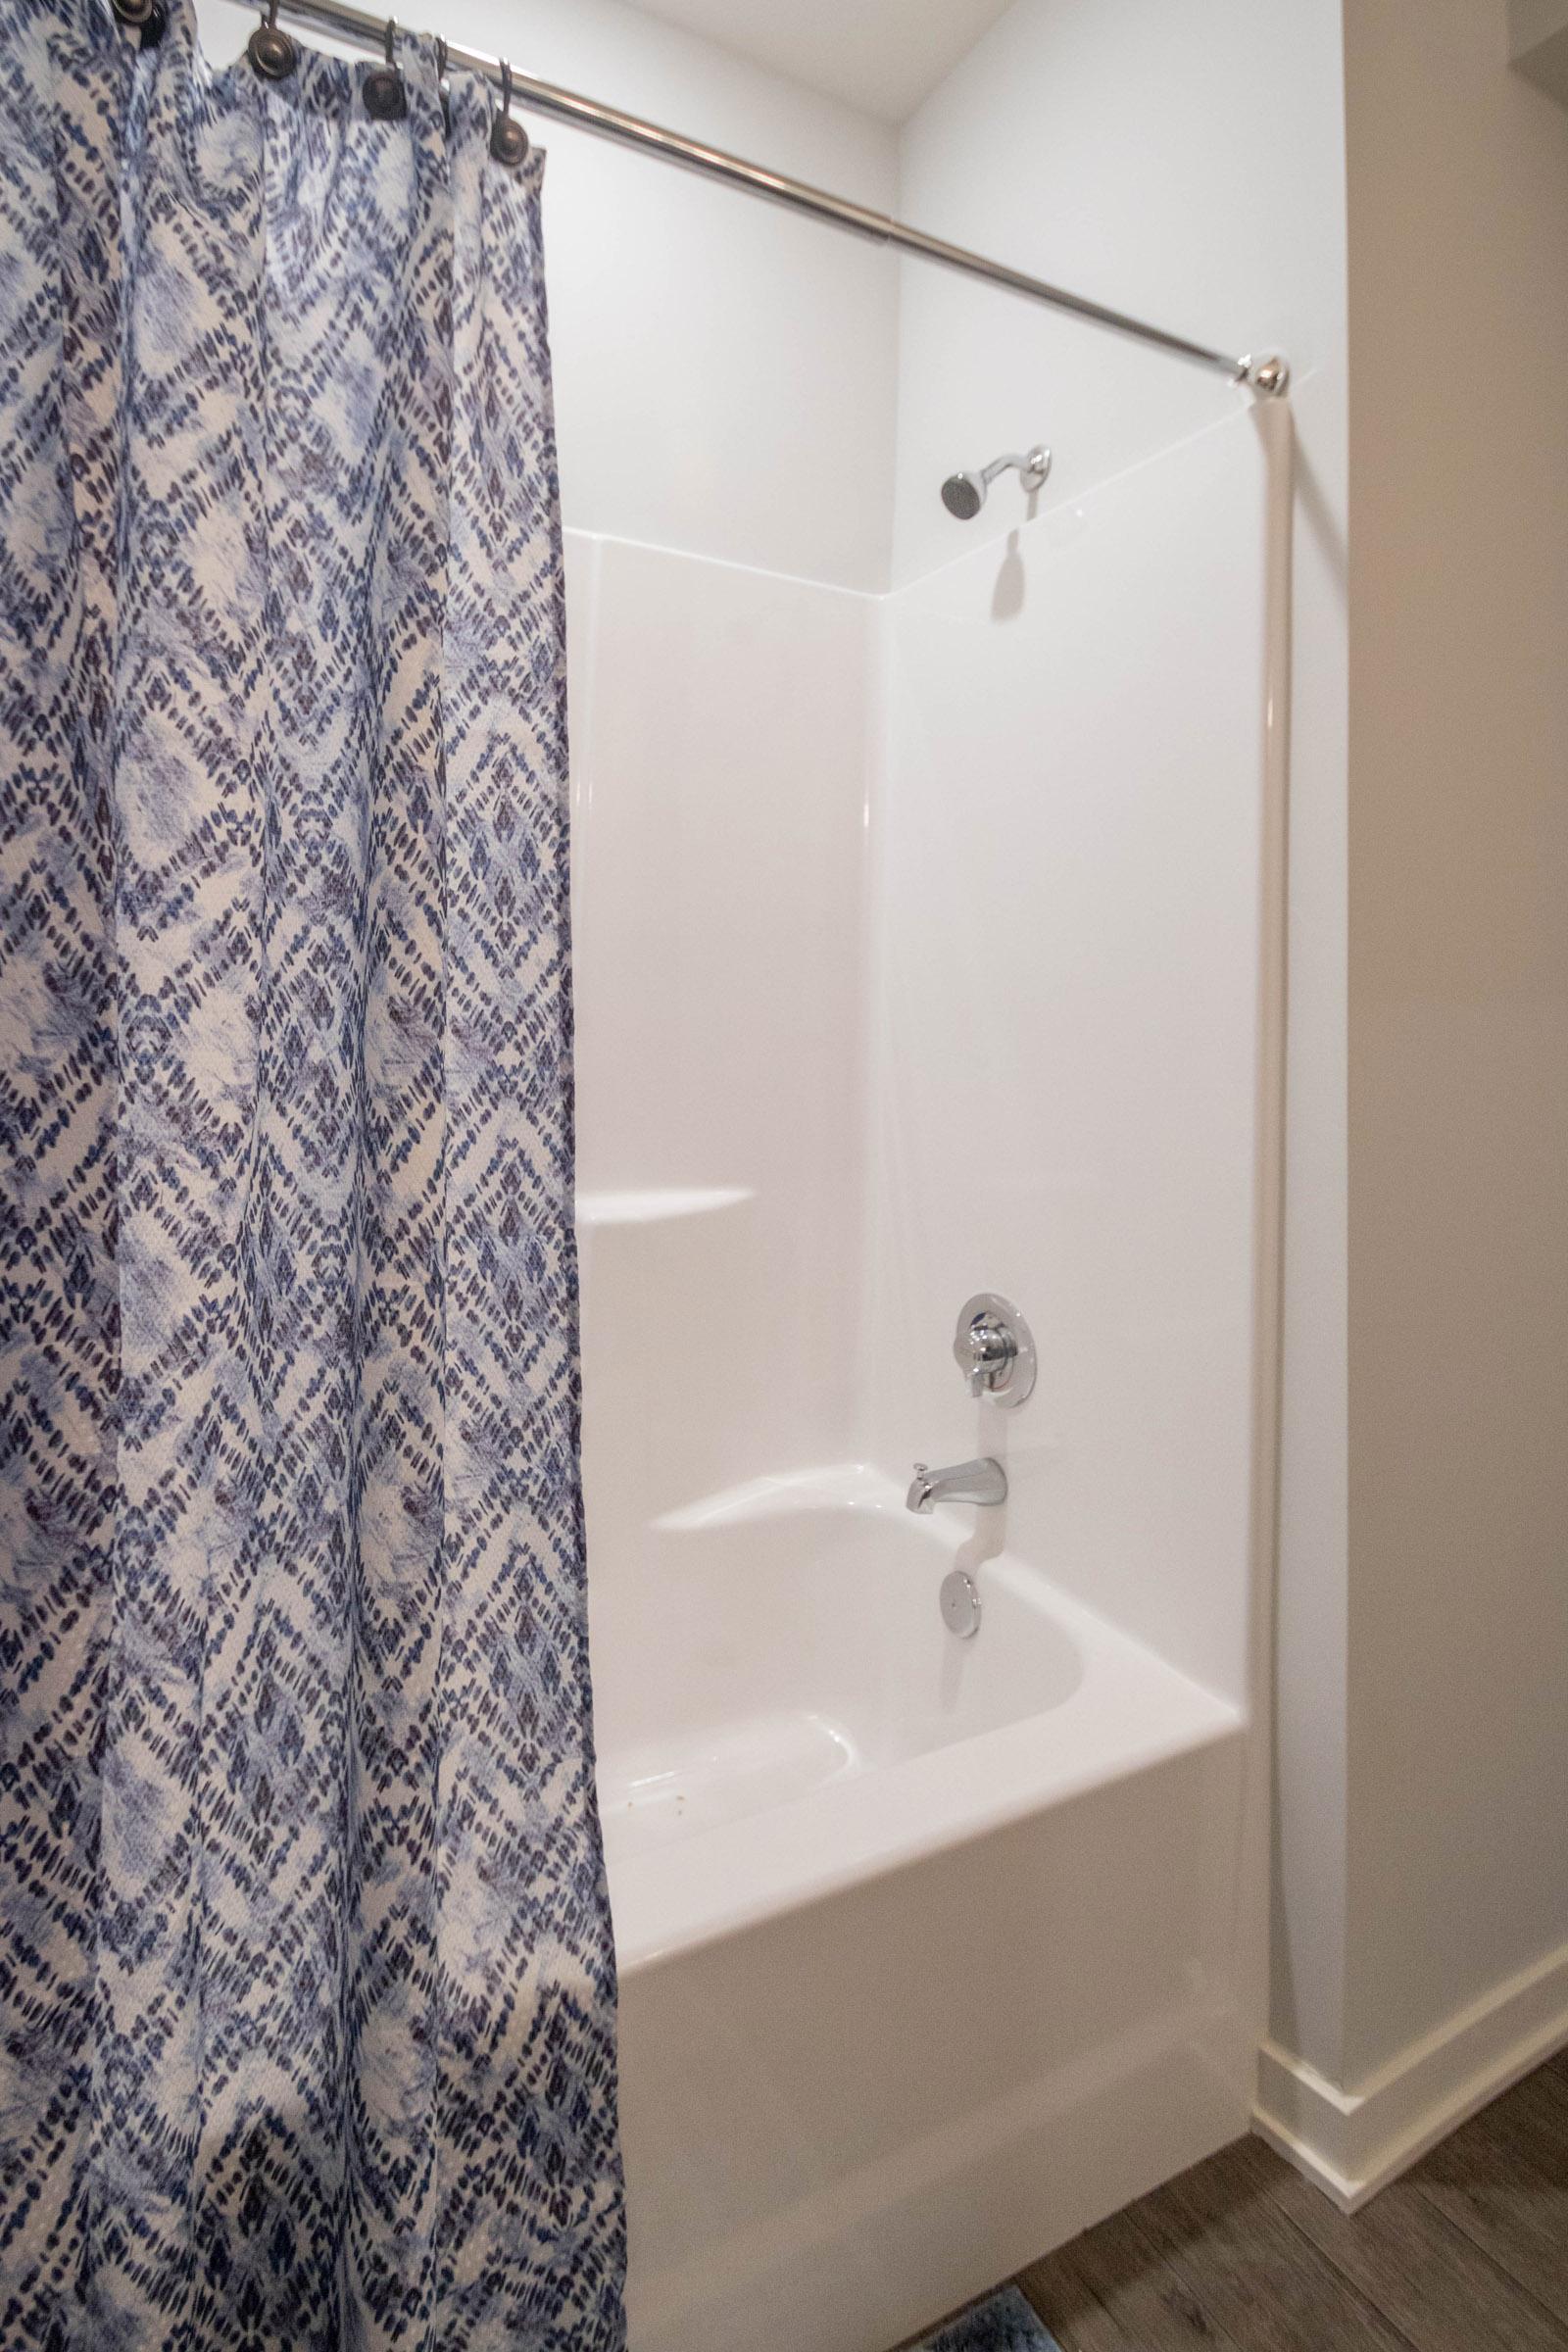 Spacious Bathtub at Aspen Grove Apartments in Omaha, NE